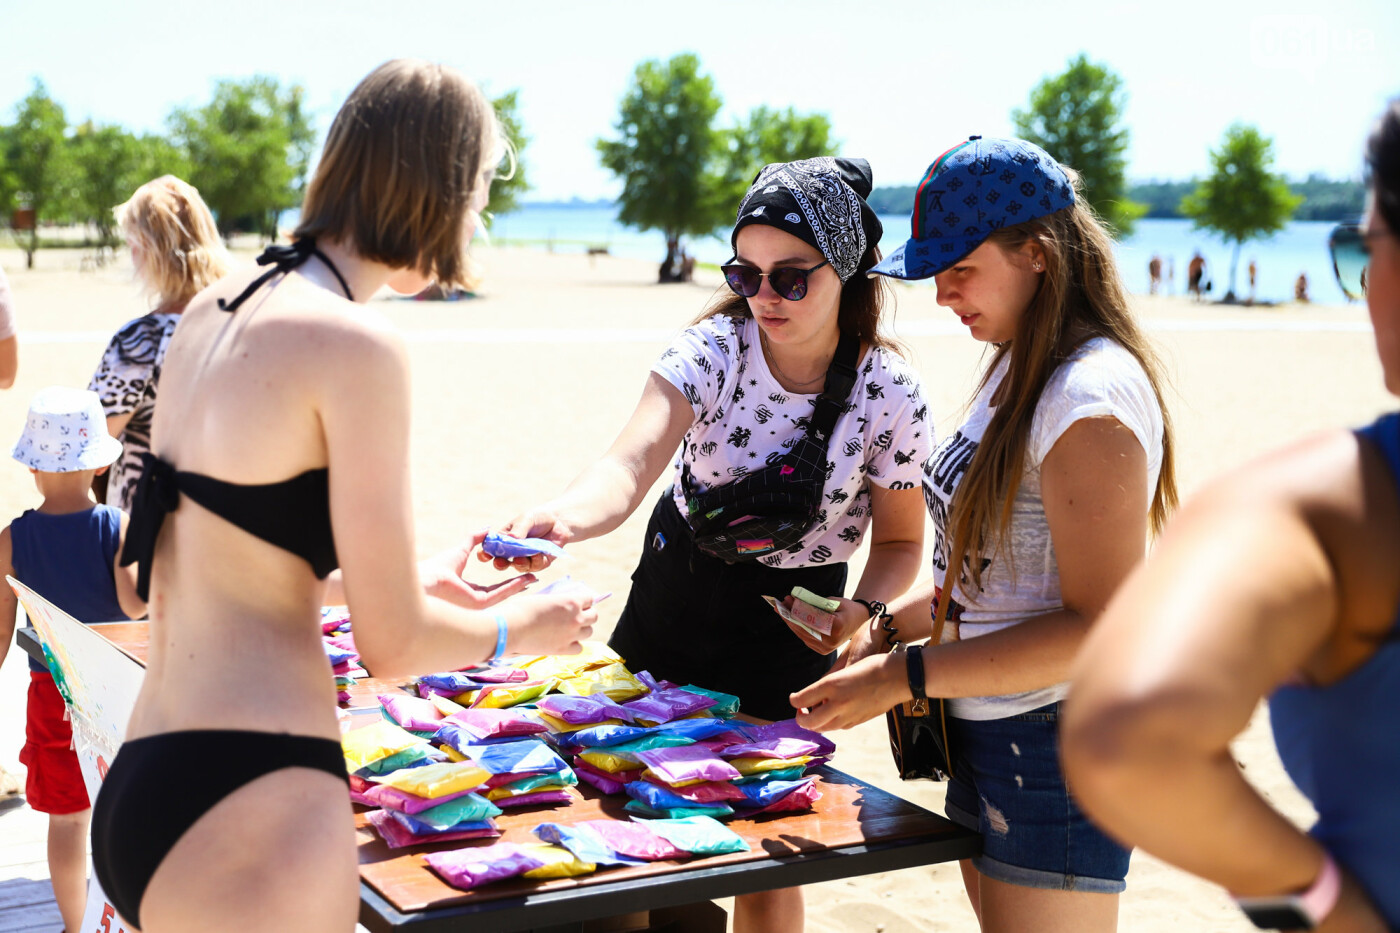 Сотни запорожцев приняли участие в фестивале красок Холи, - ФОТОРЕПОРТАЖ, фото-1